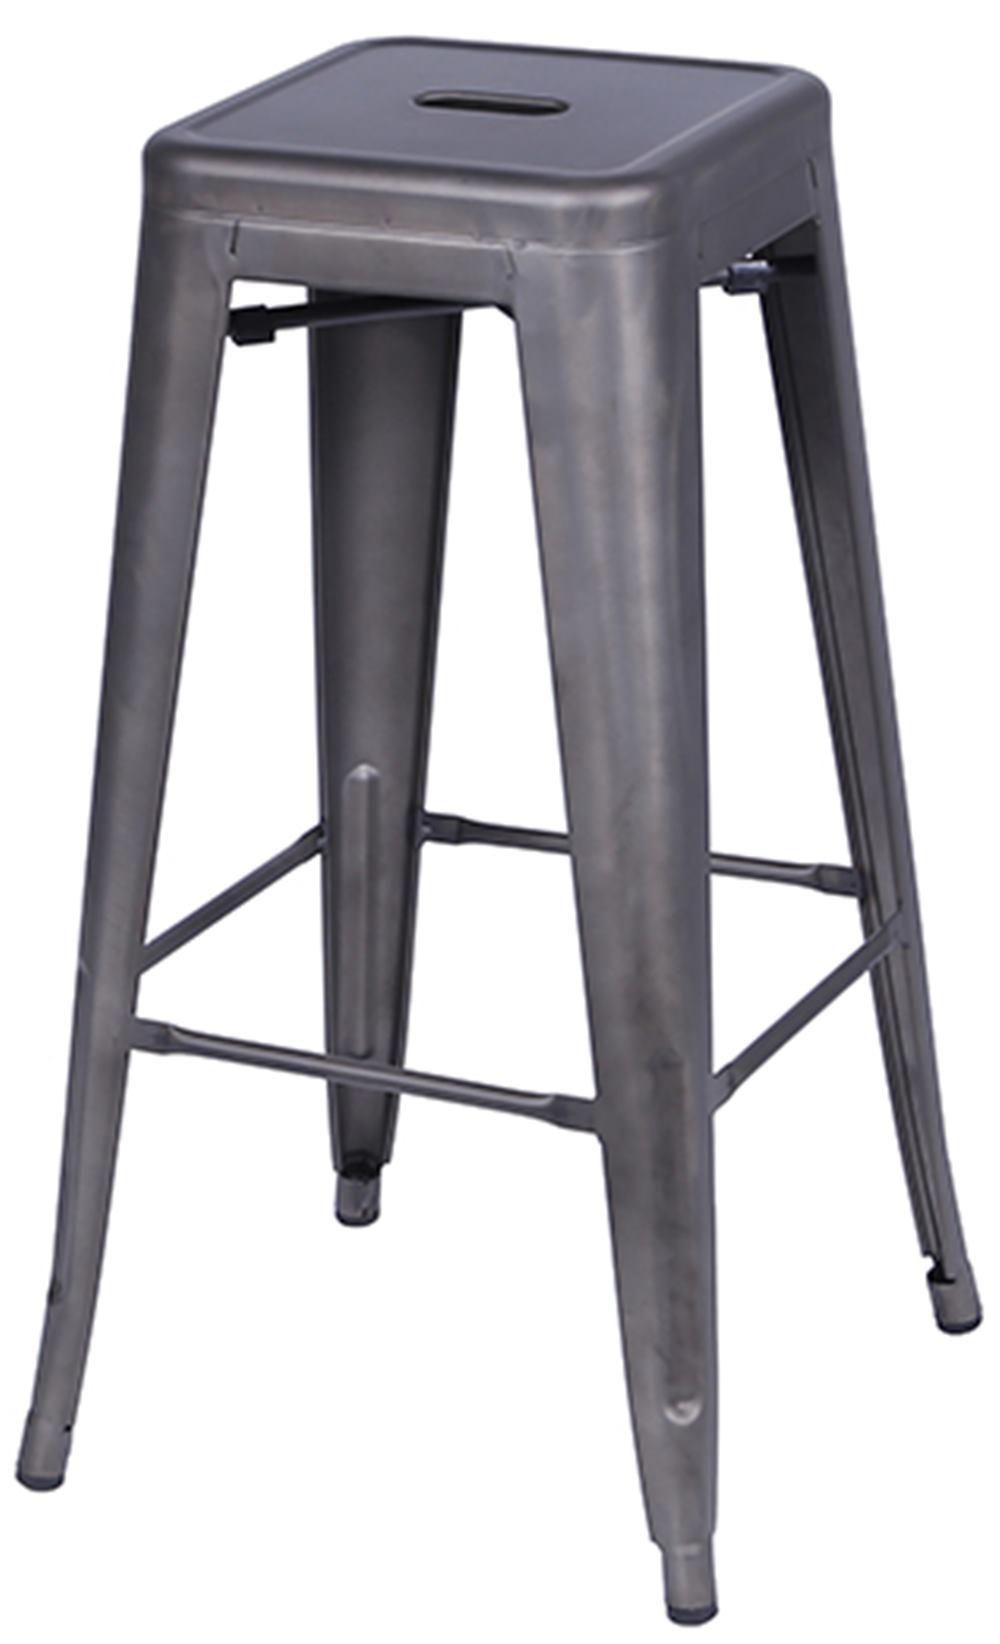 Banqueta Industrial Iron Bronze Alta 76 cm (ALT) - 32947